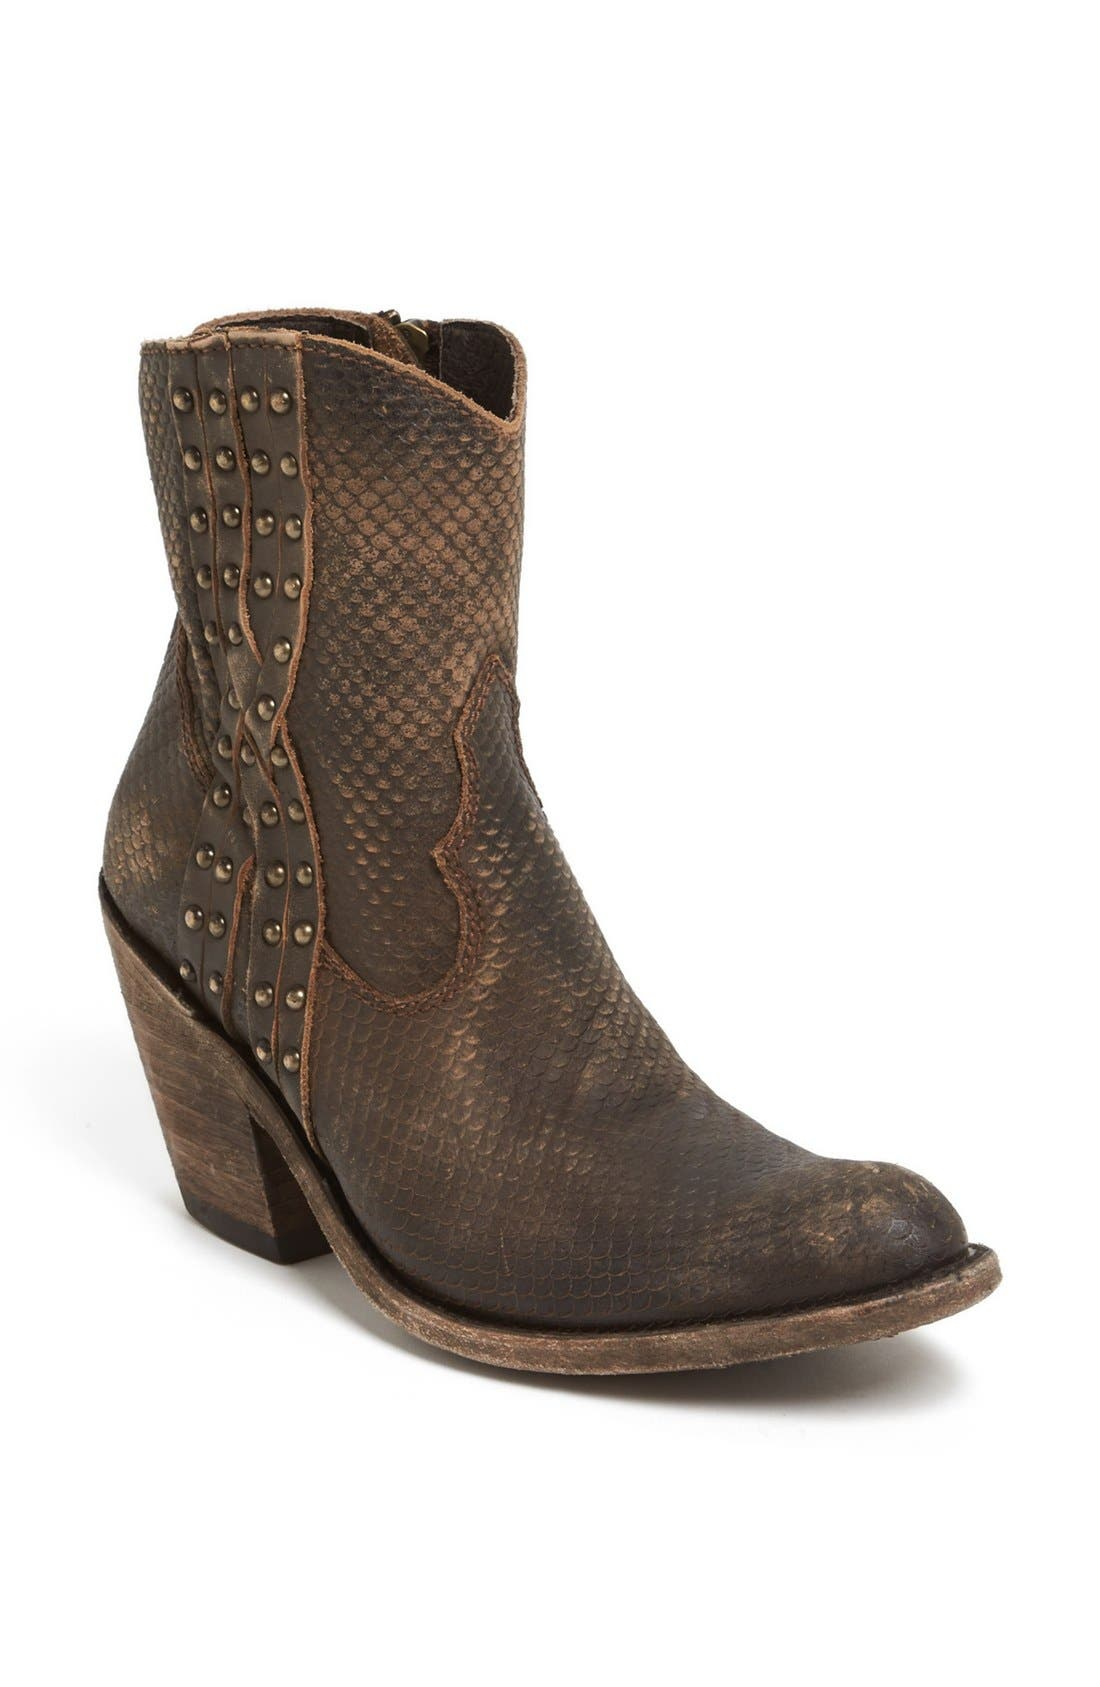 Alternate Image 1 Selected - Liberty Black Studded Short Western Boot